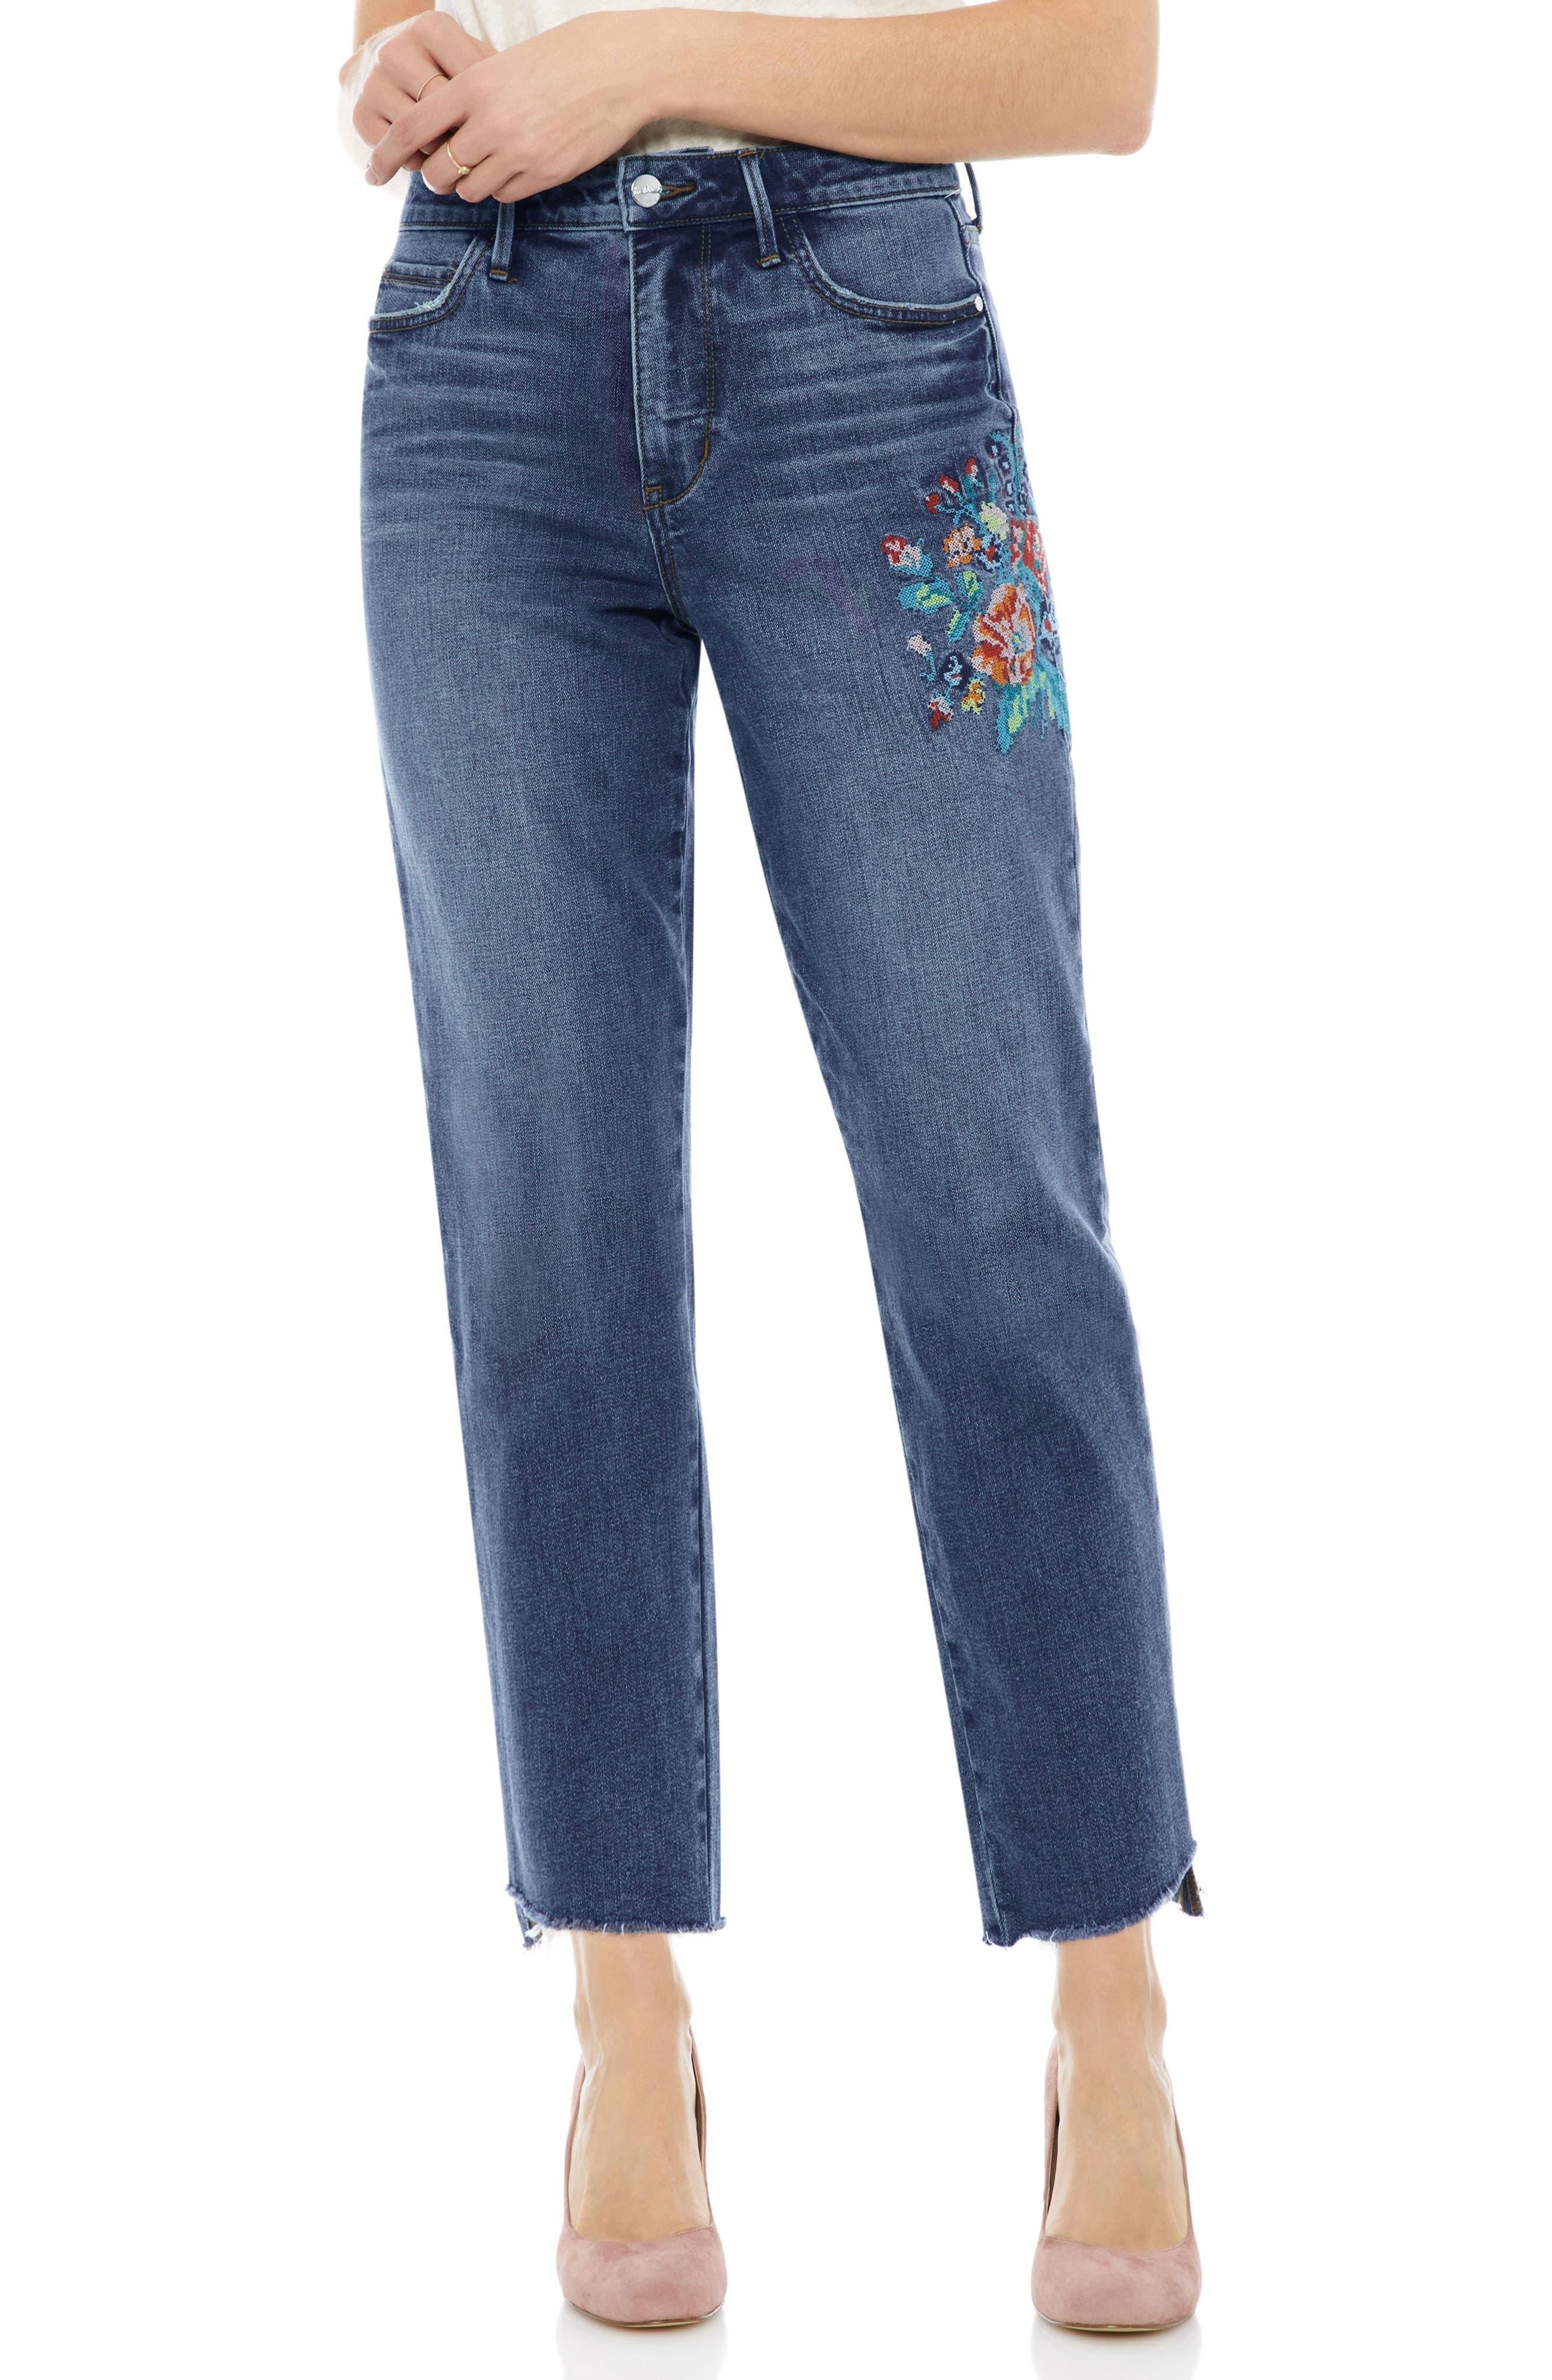 SAM EDELMAN,                             The Mary Jane Floral Accent Step Hem Jeans,                             Main thumbnail 1, color,                             420